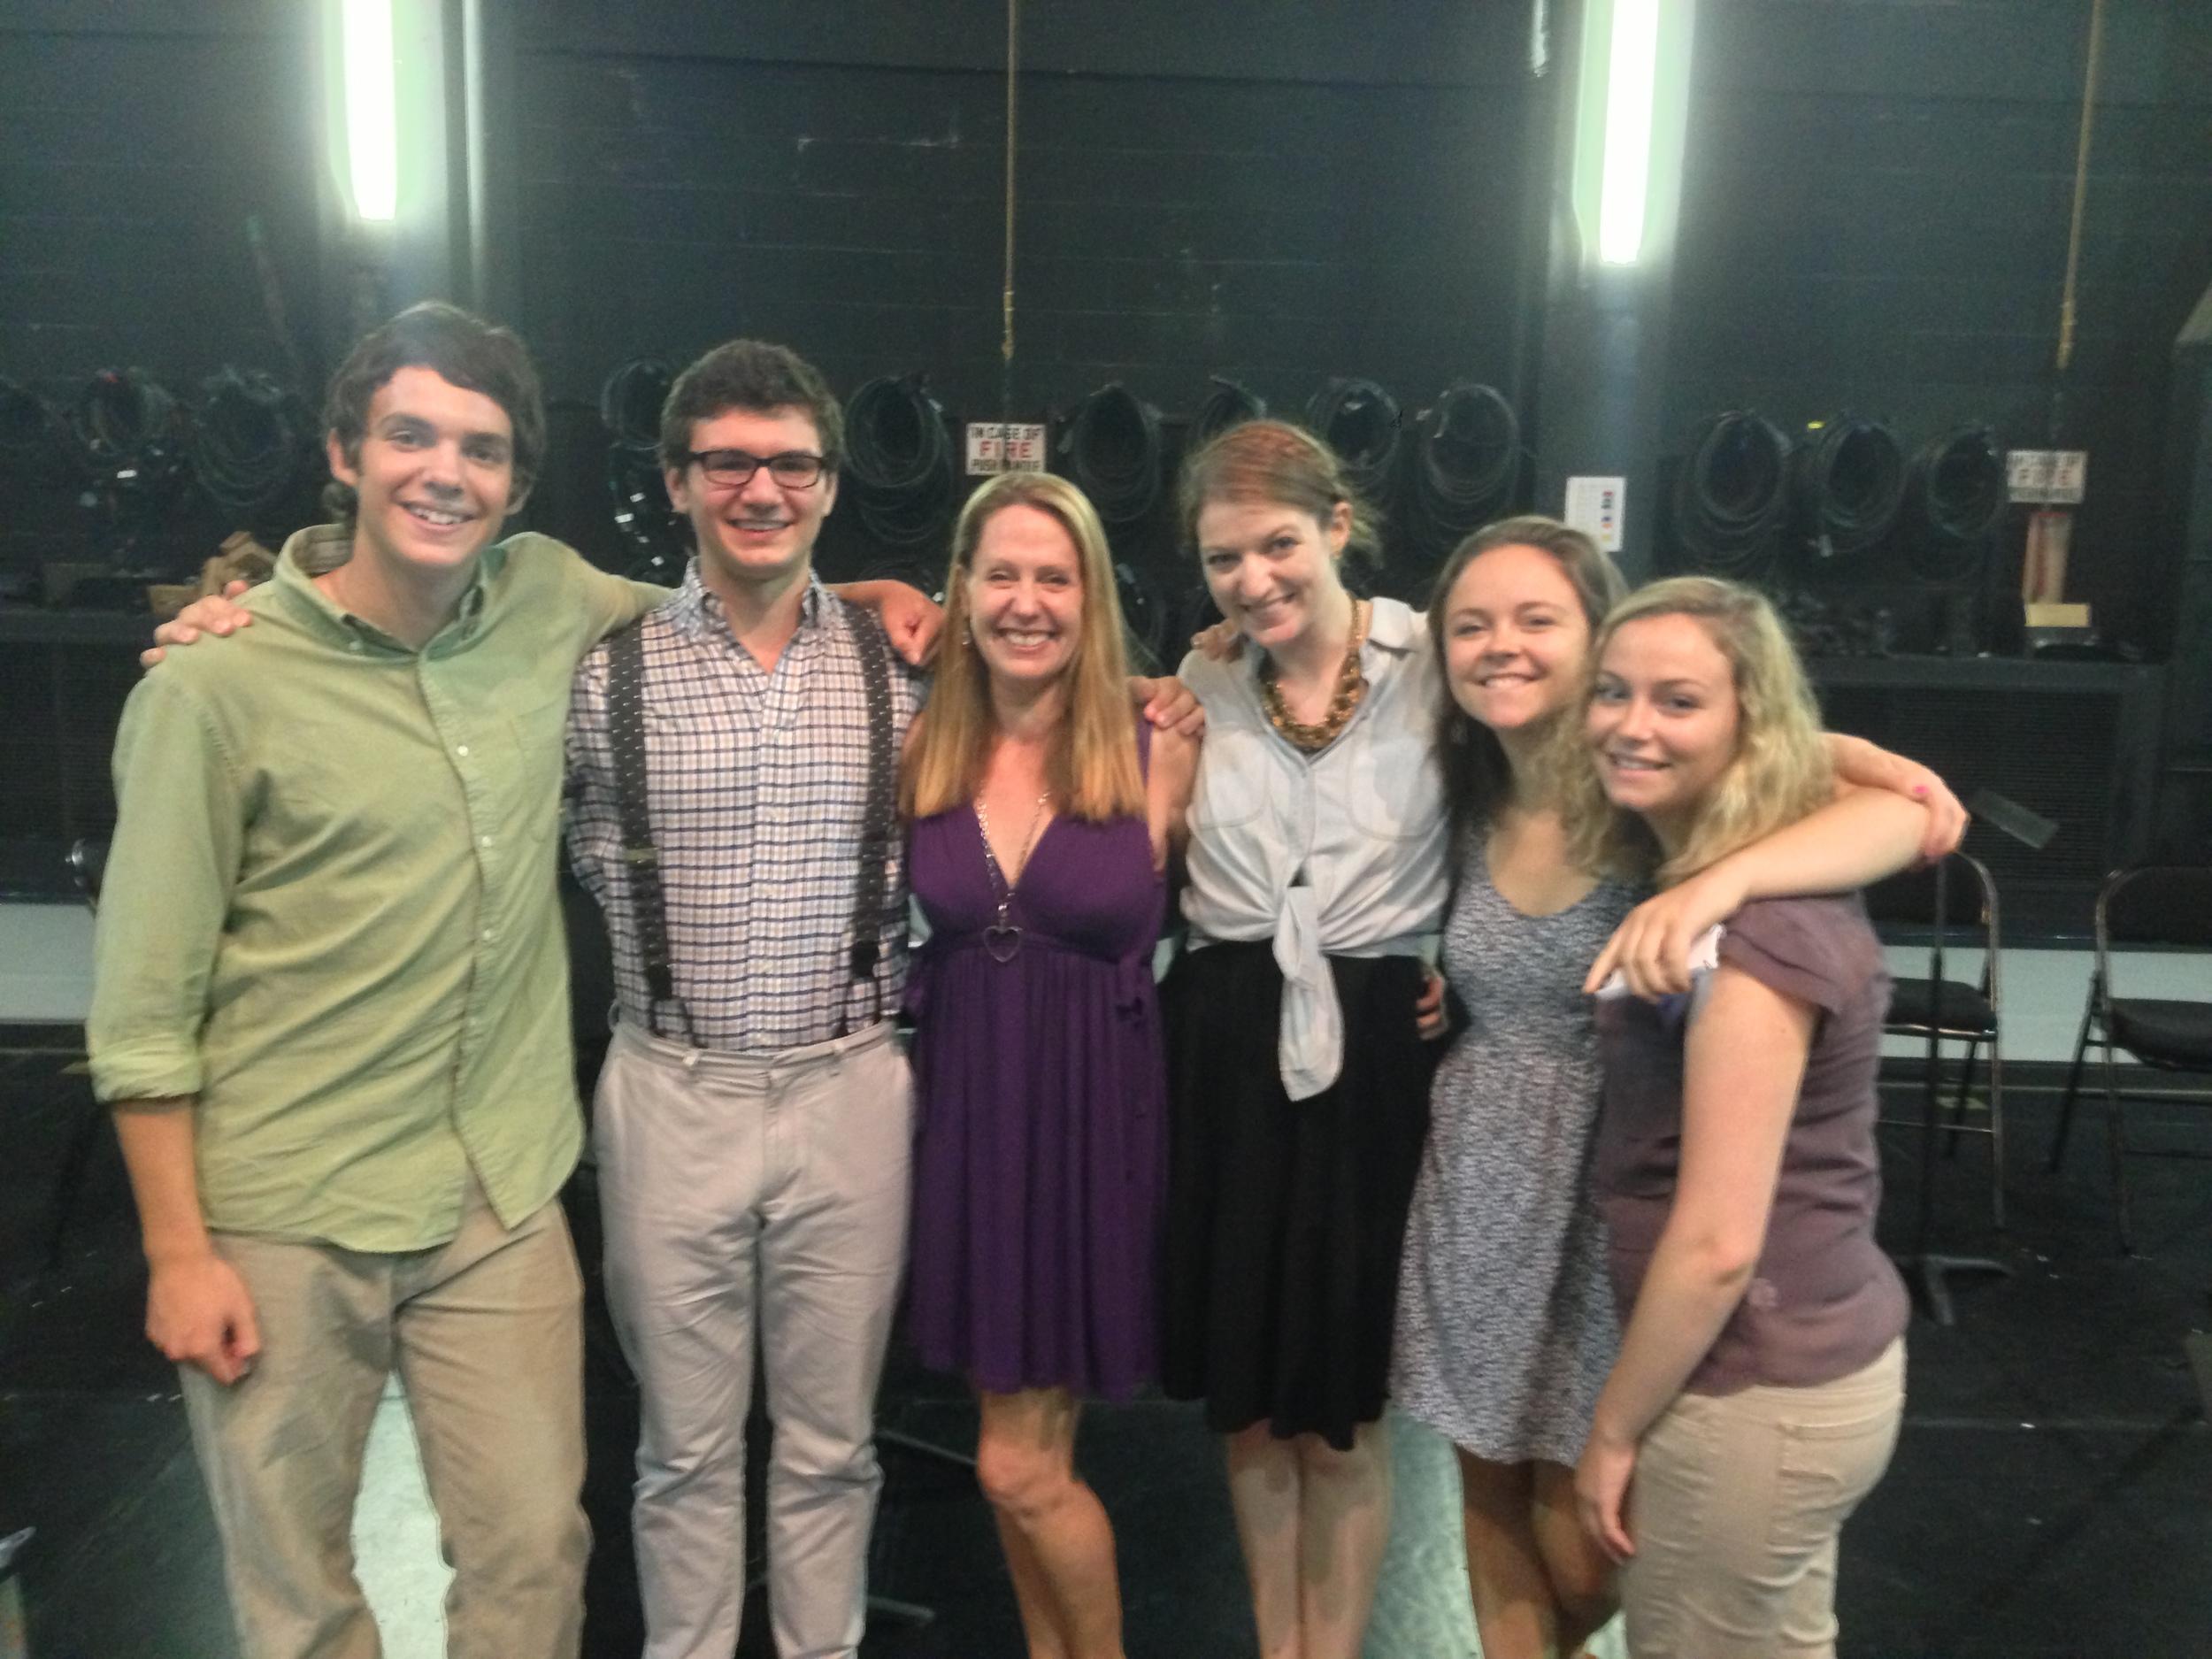 Oneida (left to right): Paul Frazel, Chris Gallerani, Beth Blatt, Katie Bruestle, Emma Orme, Katelyn Onufrey